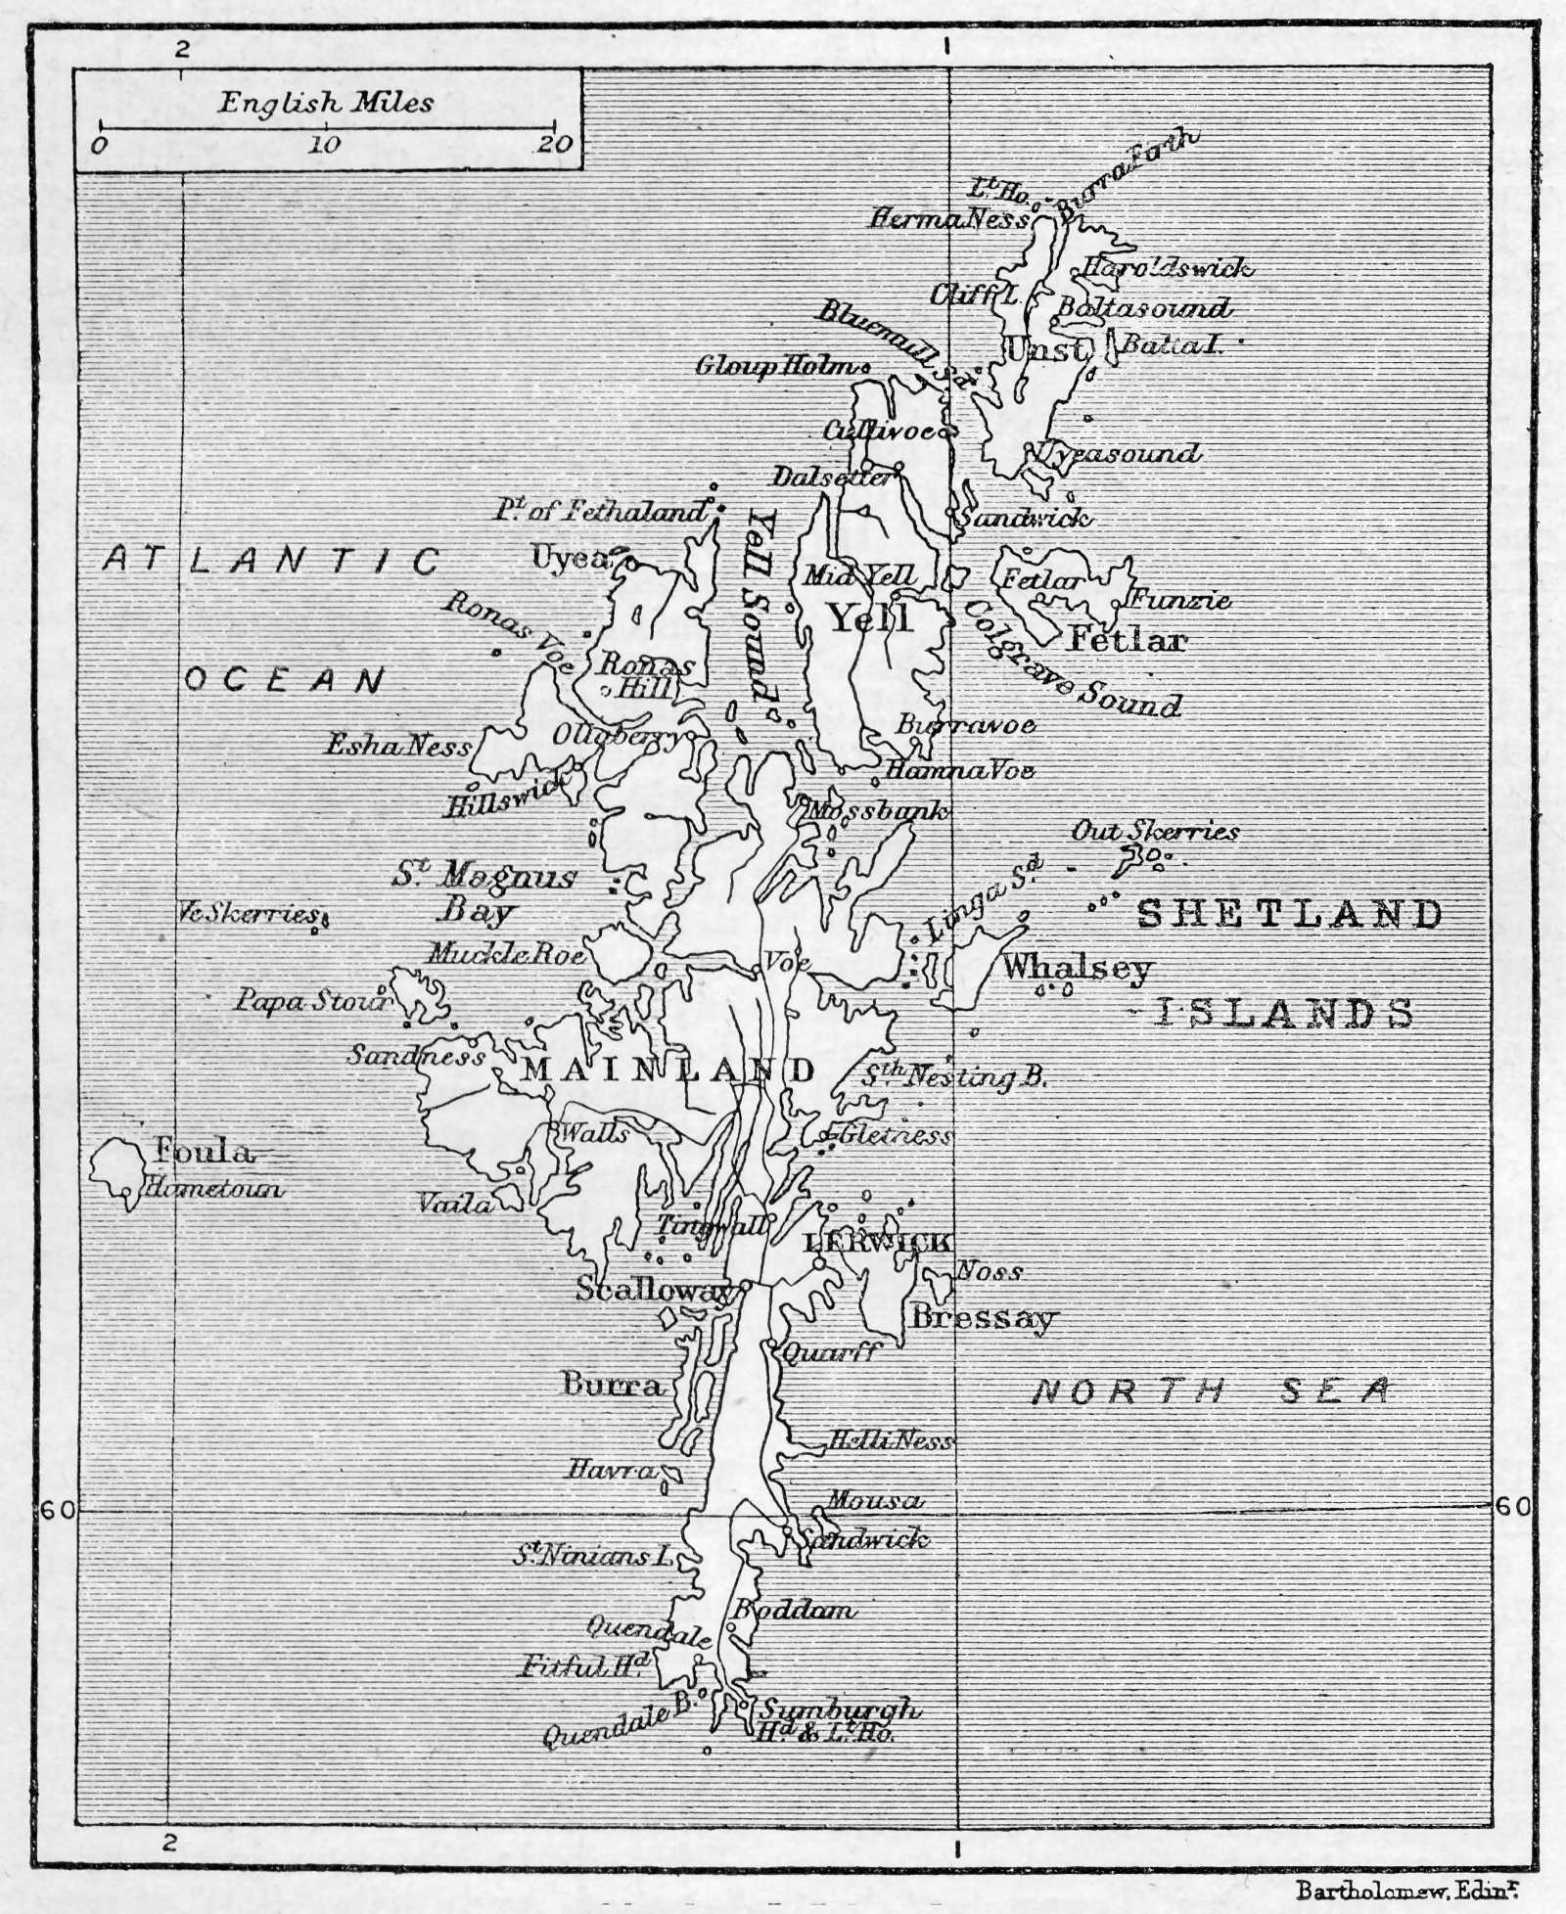 Map of Shetland Islands 1906